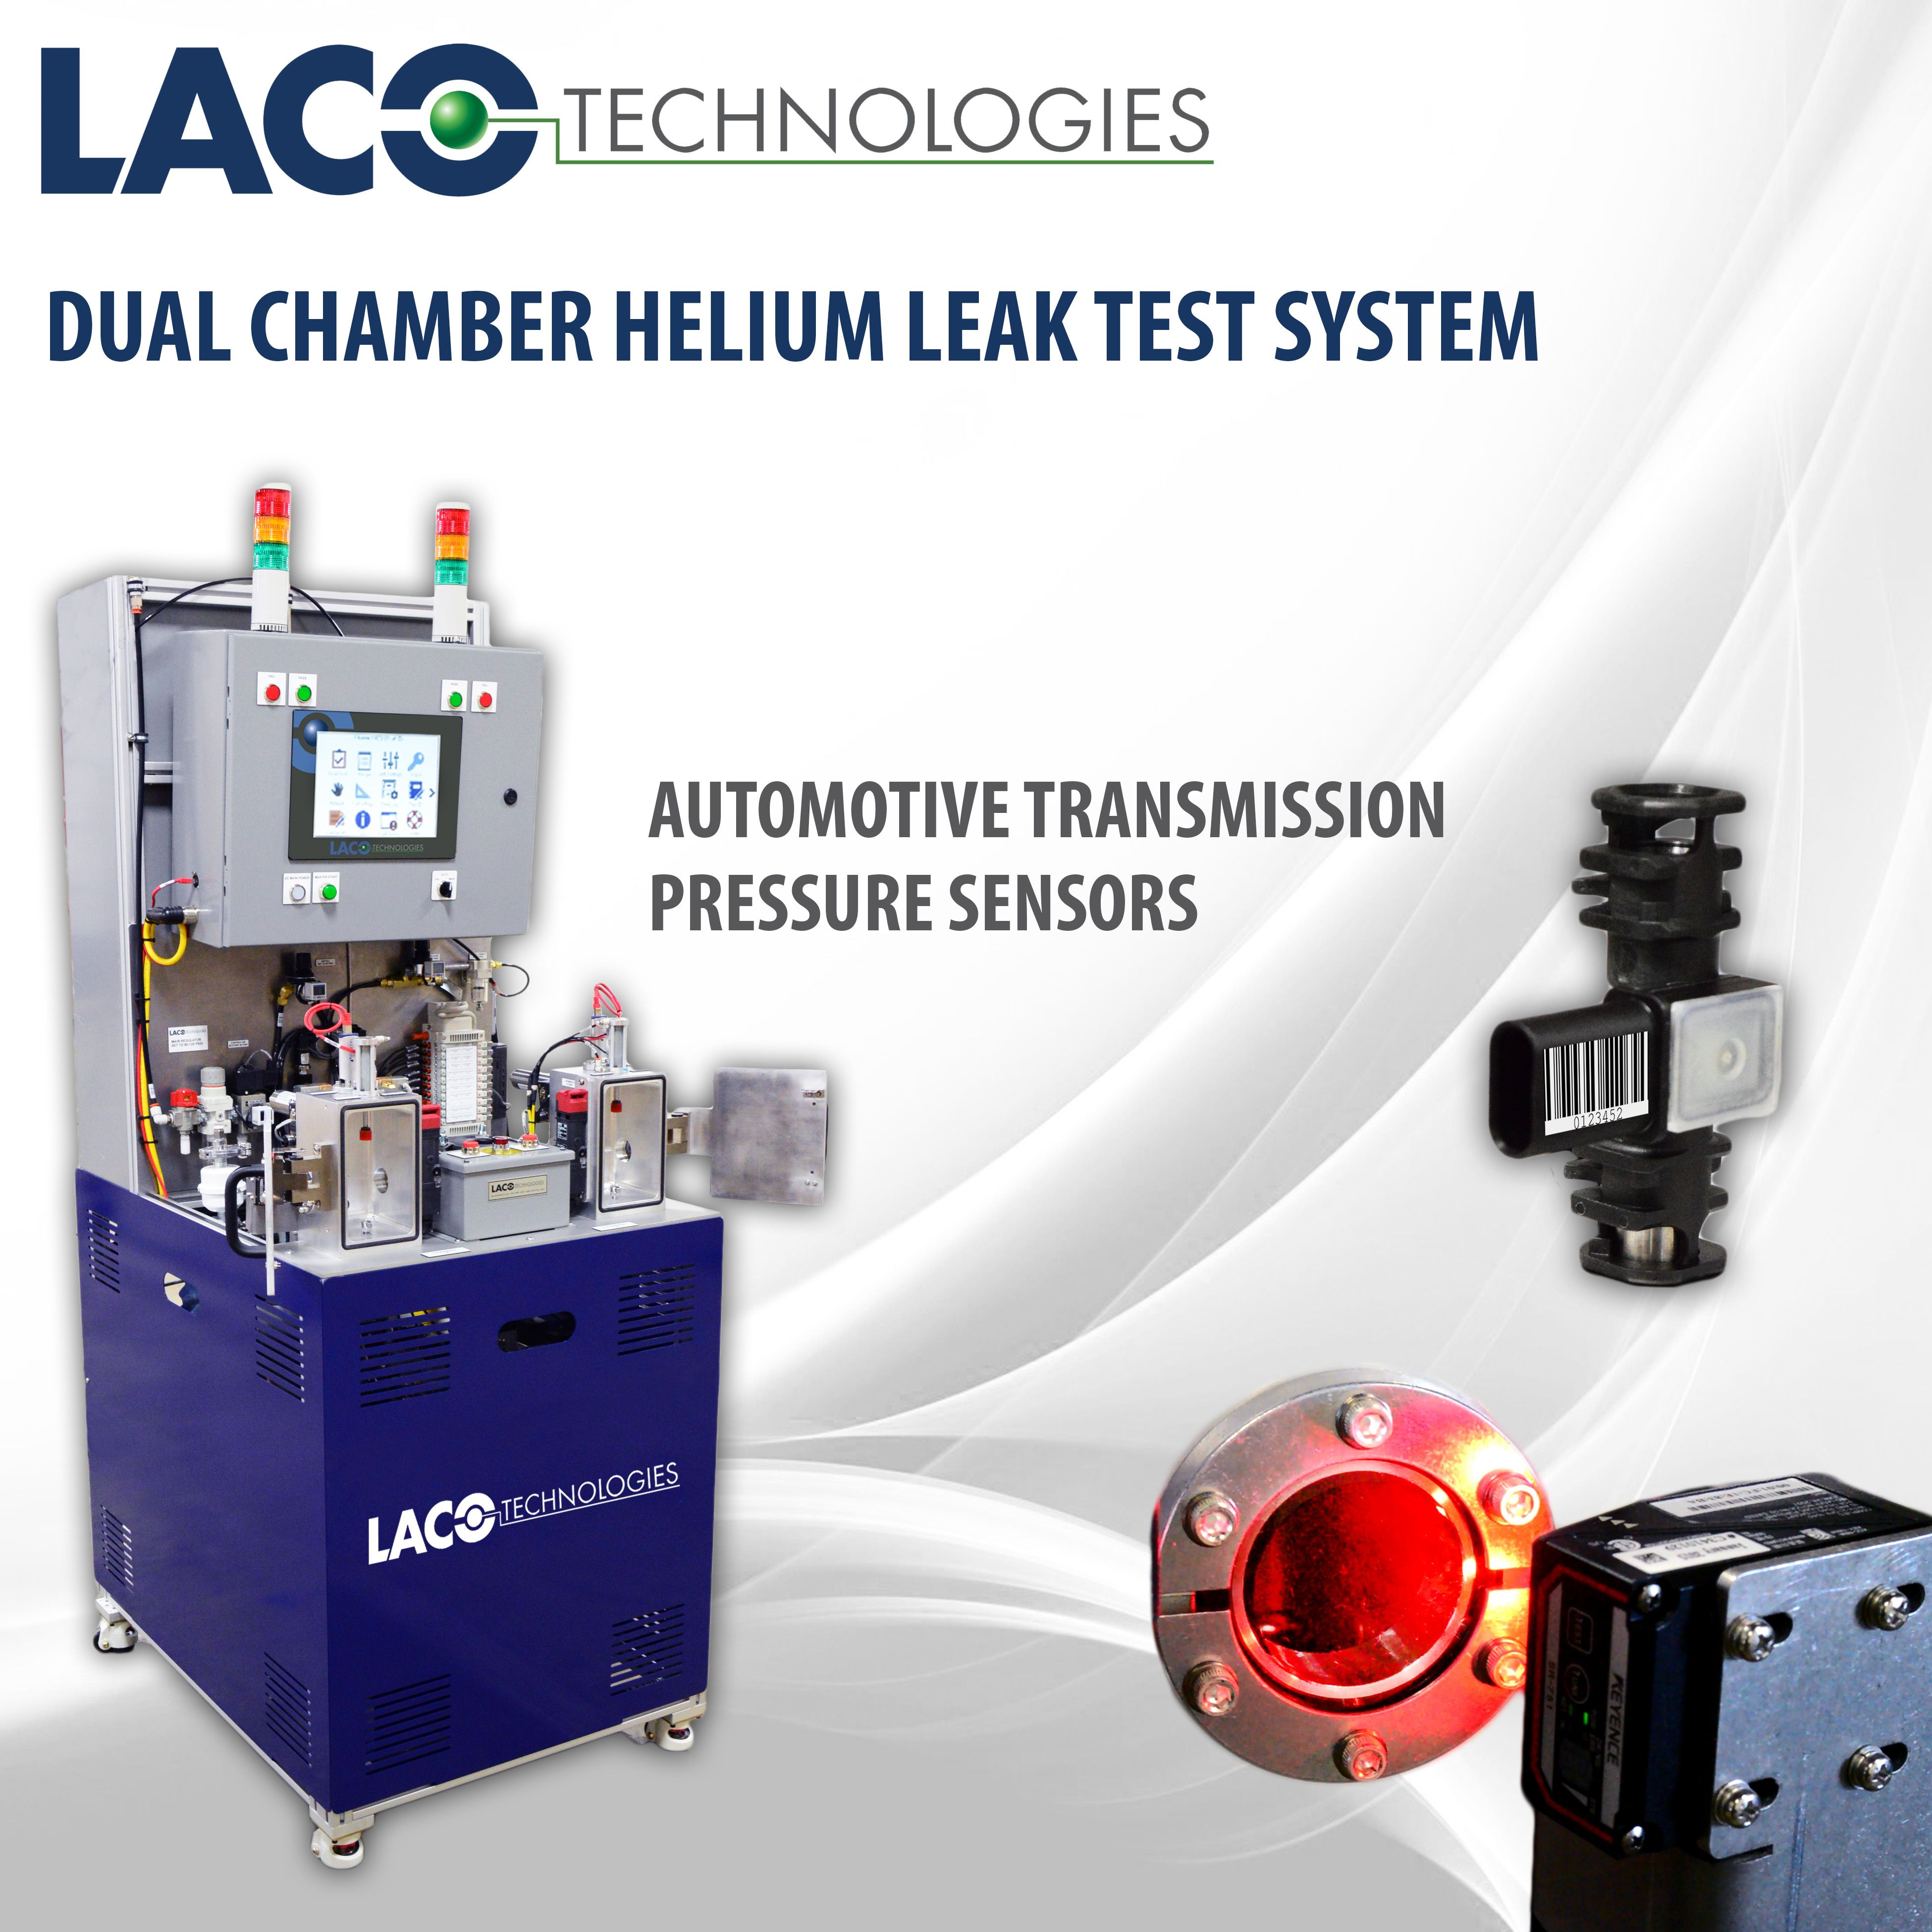 Innovator in advanced sensing technologies had a leak